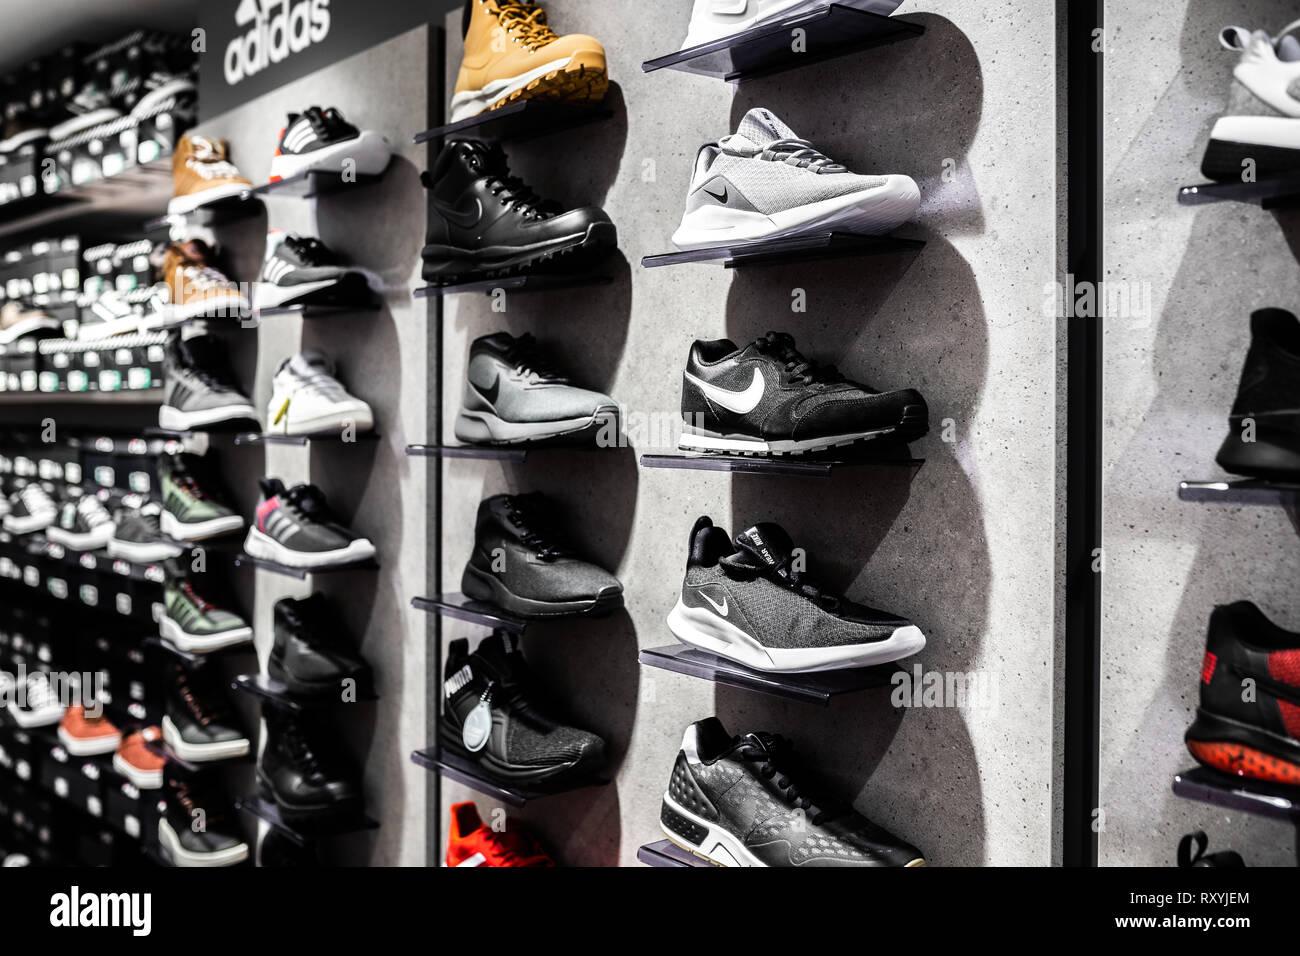 Black Nike Sneakers Immagini   Black Nike Sneakers Fotos Stock - Alamy bff250390c1